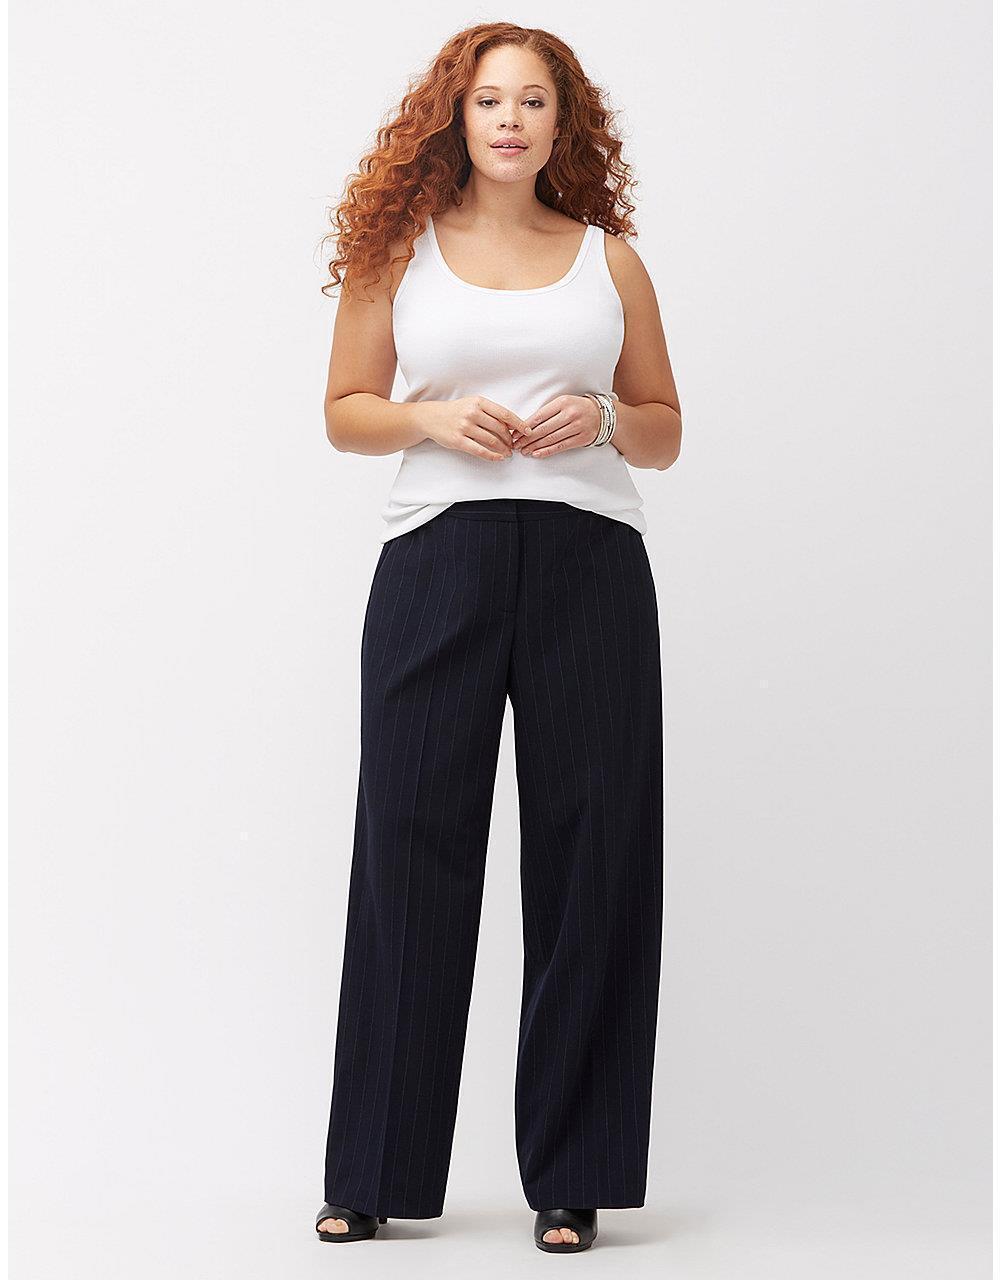 Lane Bryant Lena Tailored Navy bluee Pin Stripe Dress Trouser Pants SZ 28 WideLeg